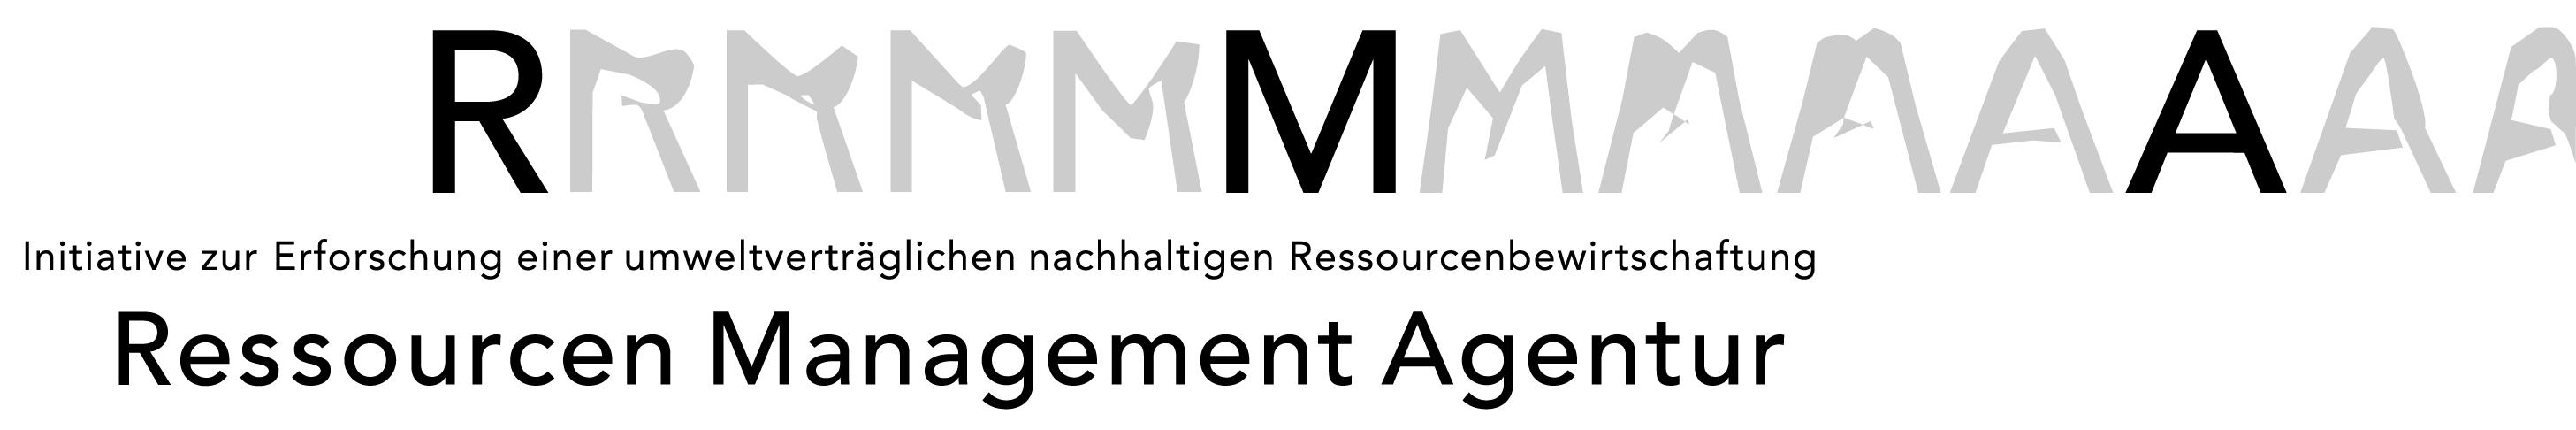 public://logo_rma_-_deutsch.jpg